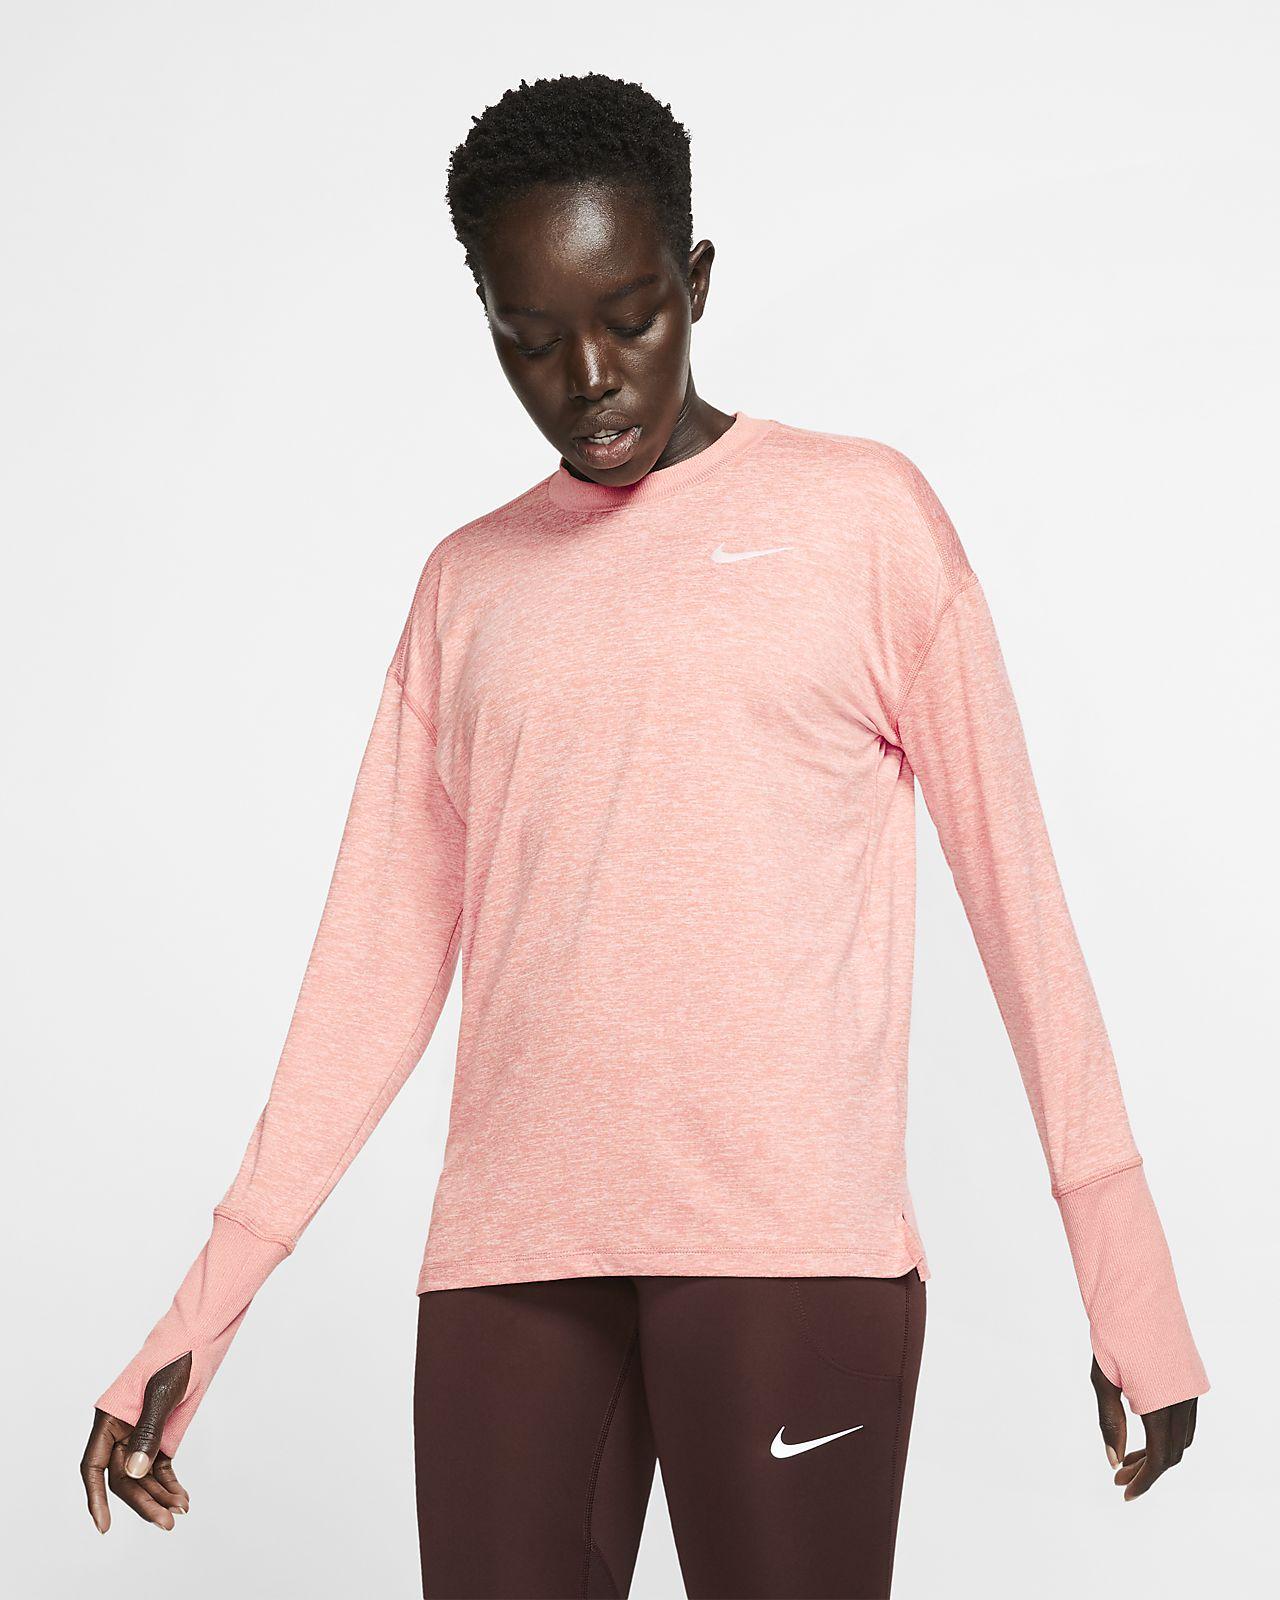 Men/'s Nike Running Dri-Fit Long Sleeve Top L Large Thumb Holes Side Zip Pocket